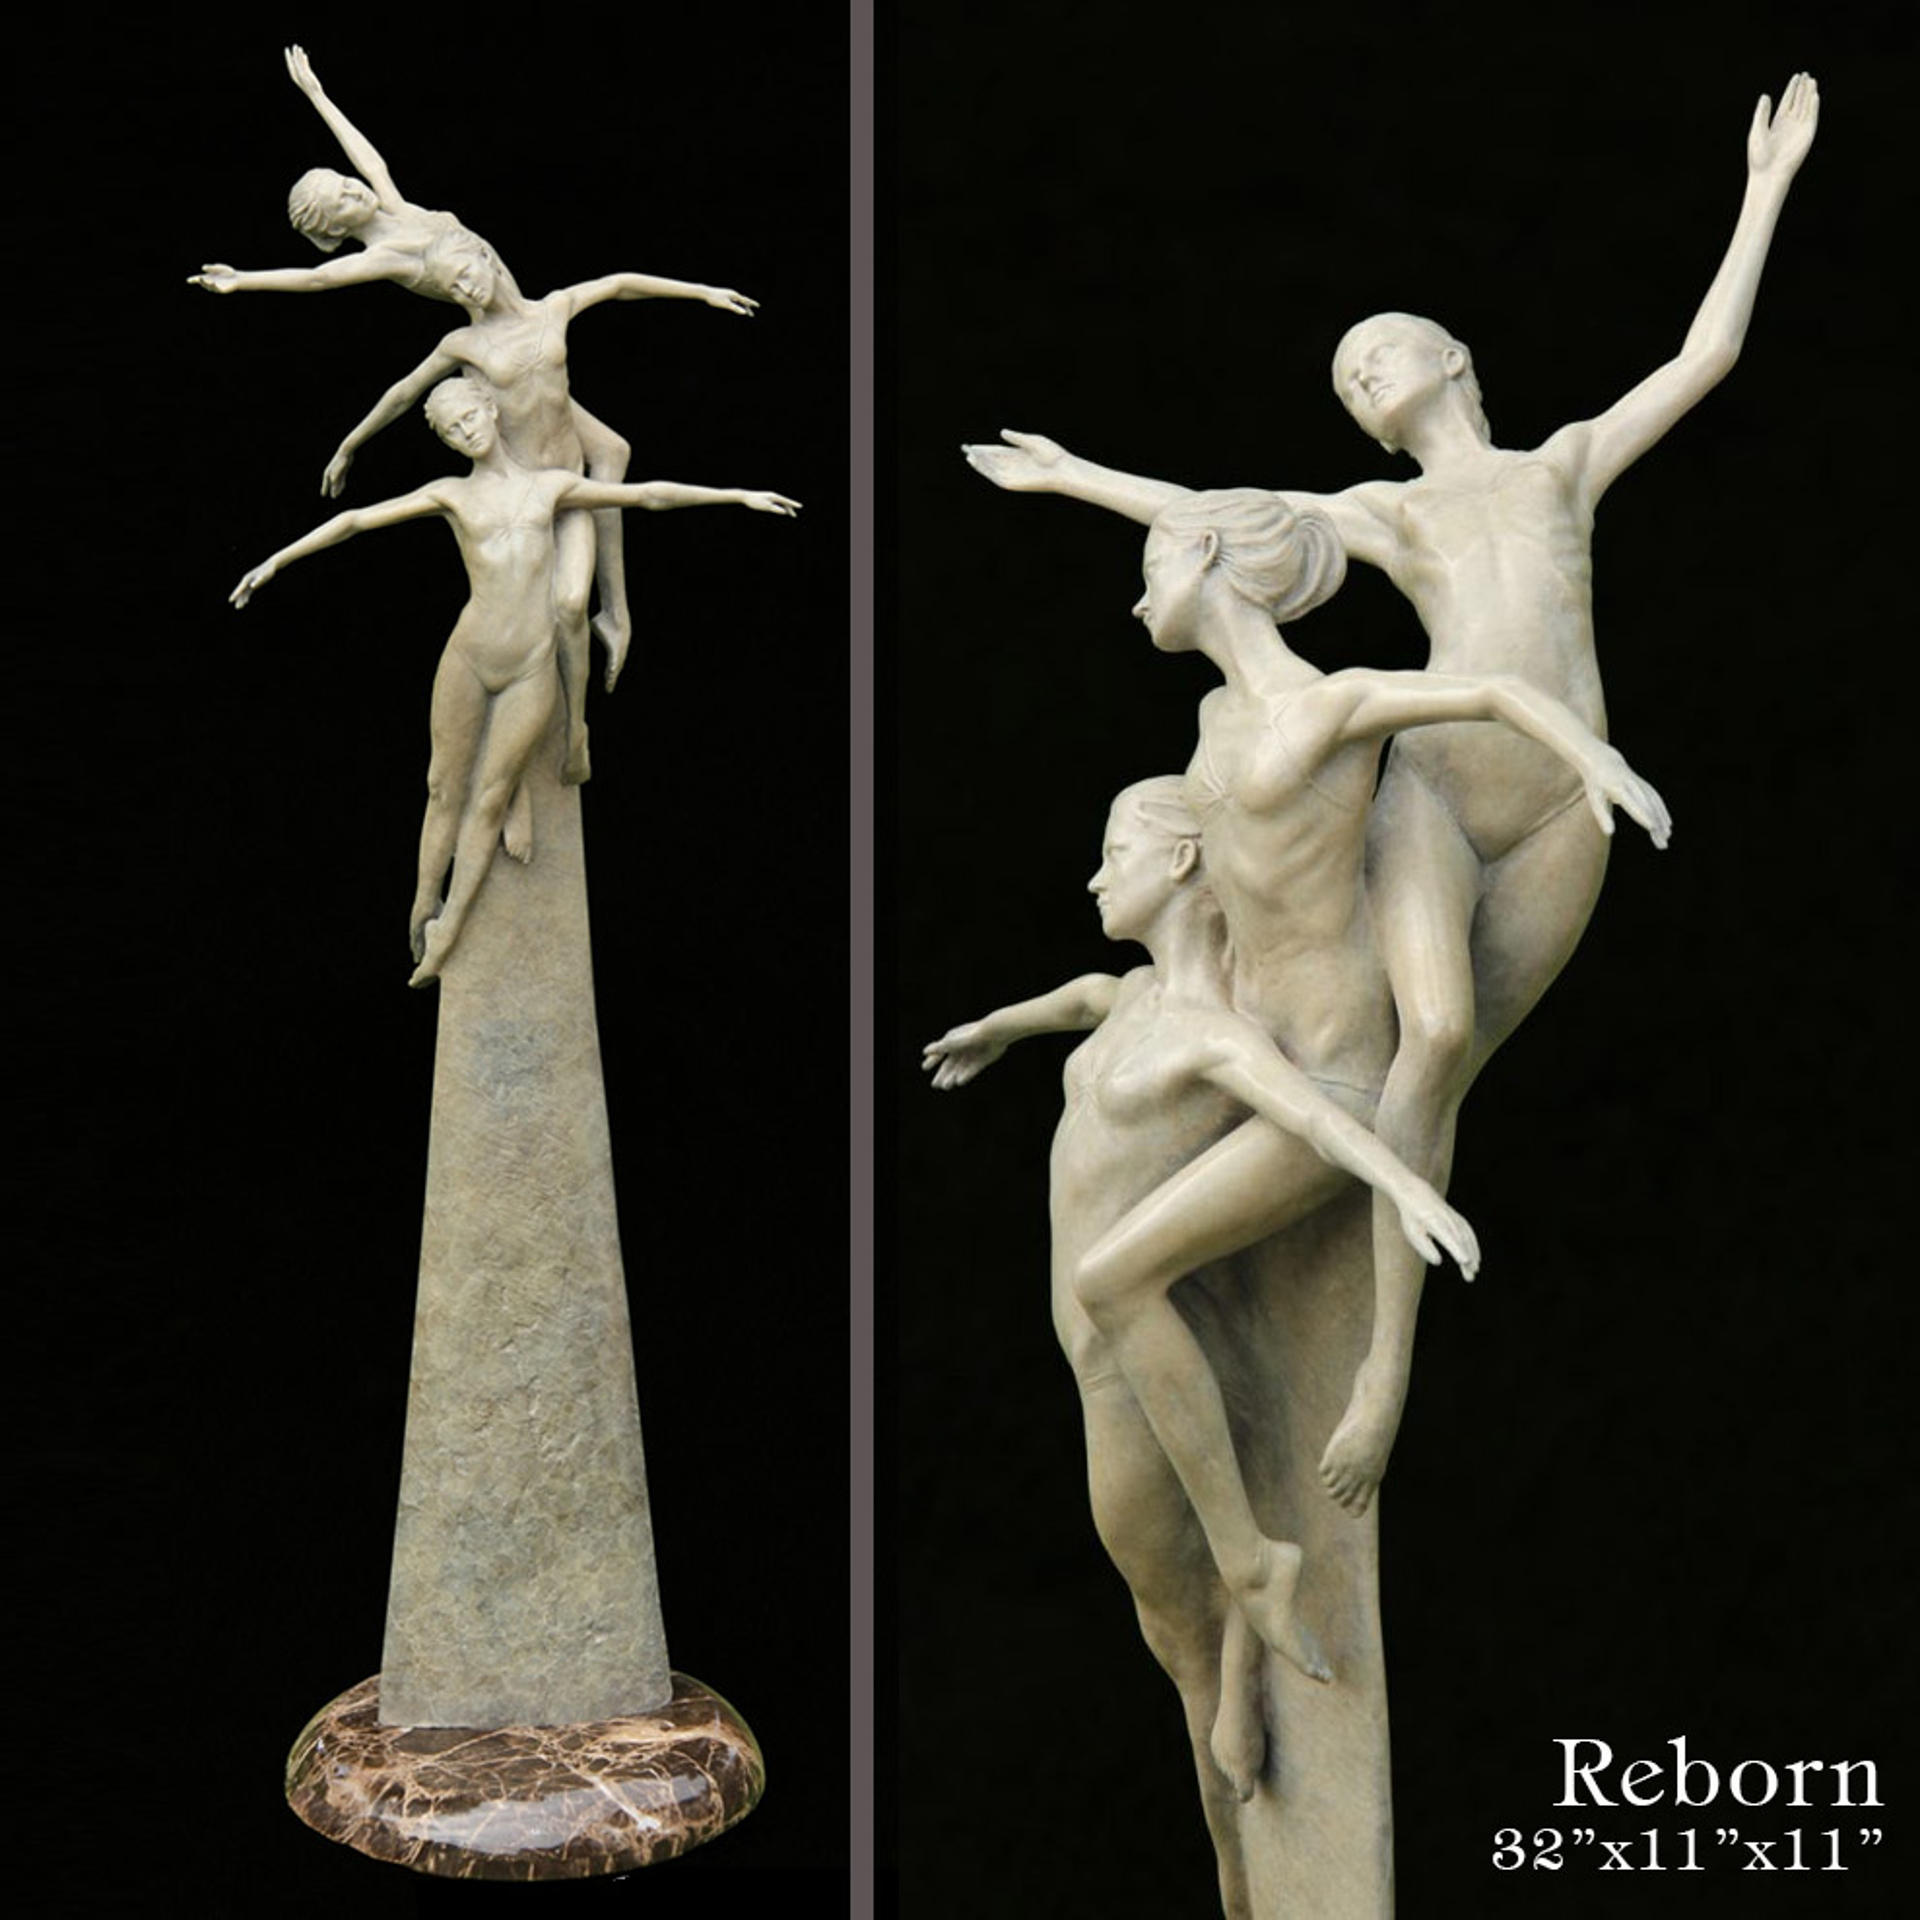 Reborn (Latte Patina) by Michael Talbot